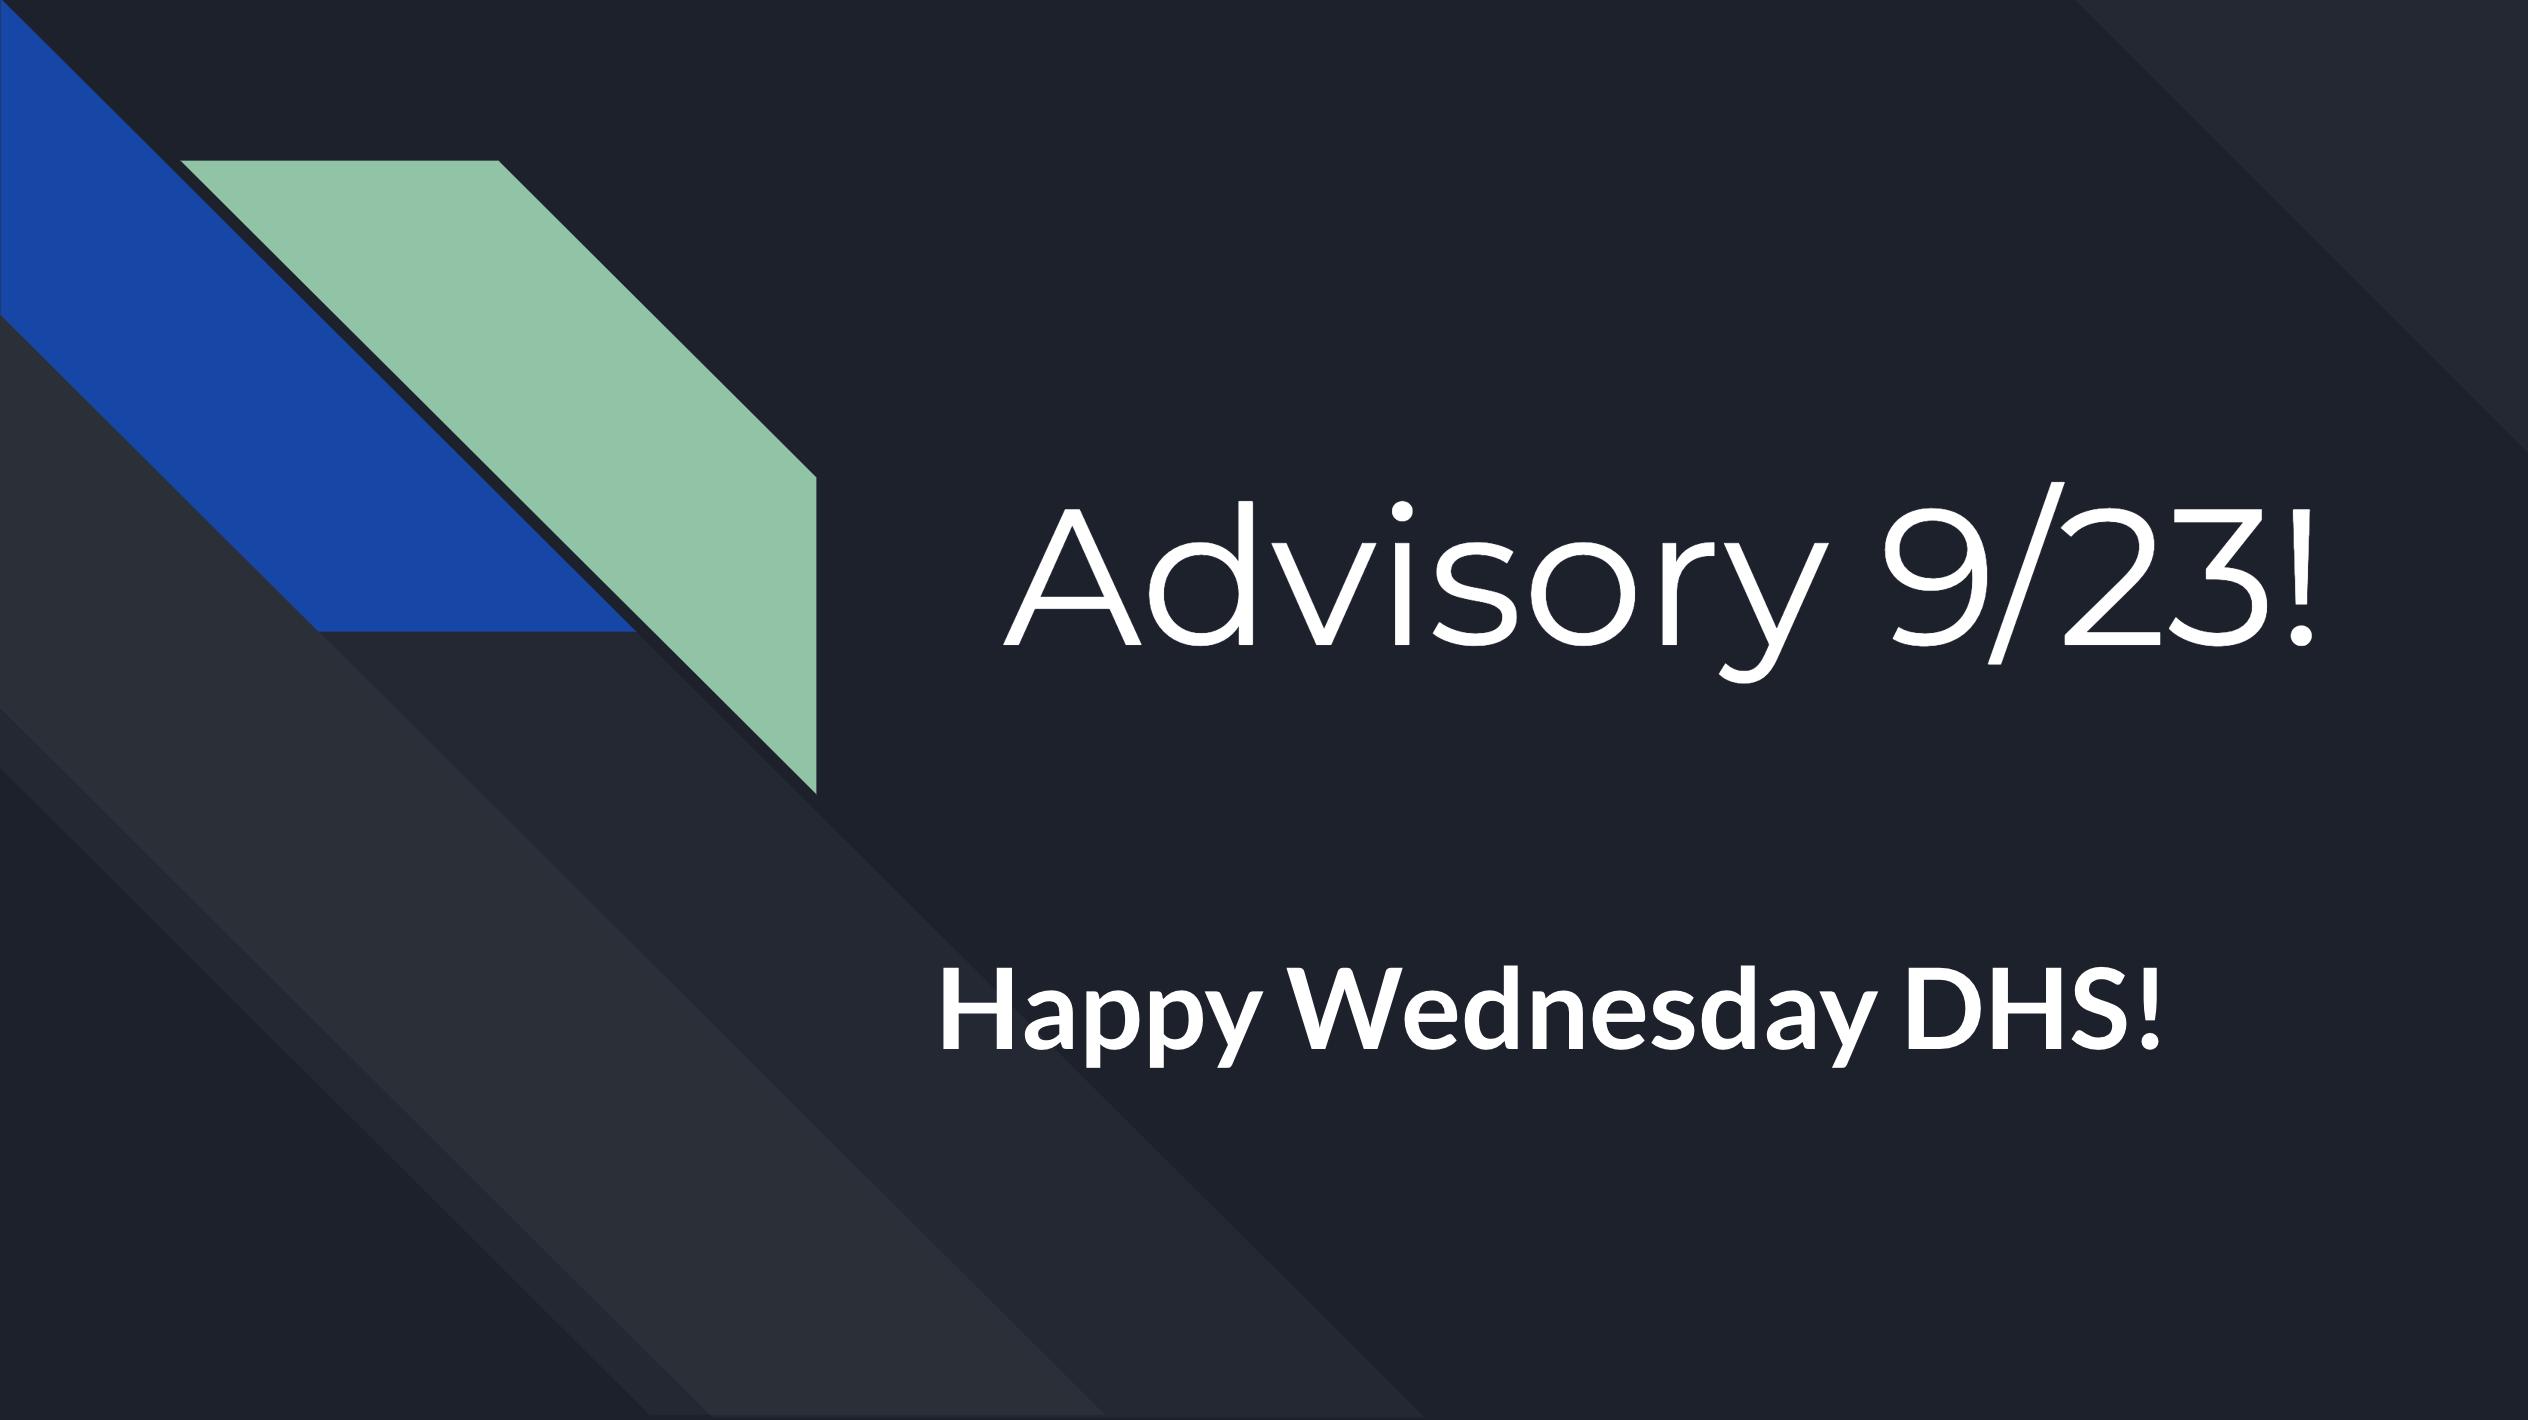 "Intro slide to advisory period reading ""Advisory 9/23! Happy Wednesday DHS"""